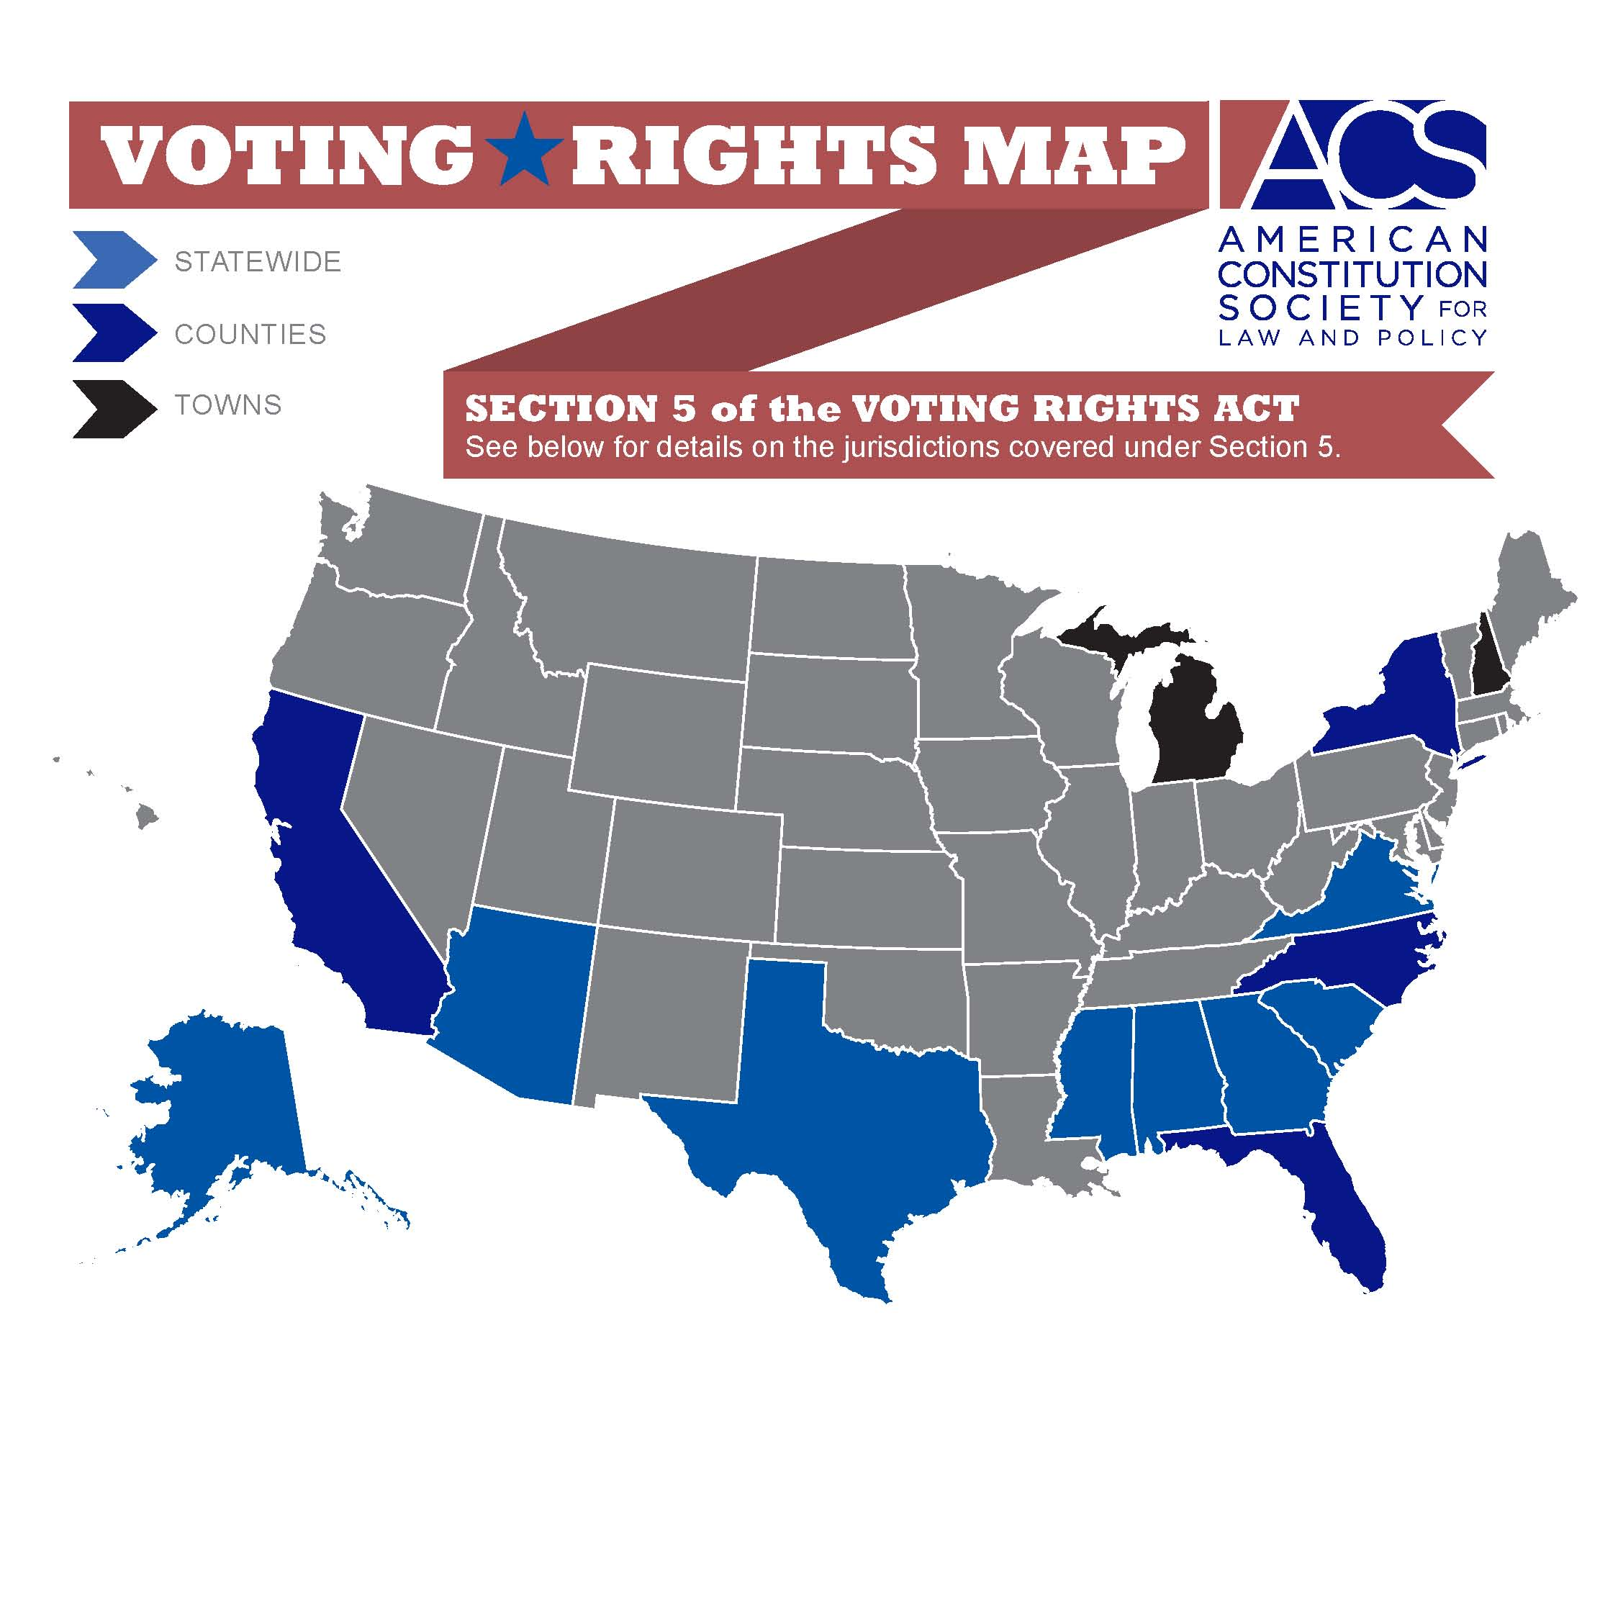 ACS_VotingRightsMap-3.jpg